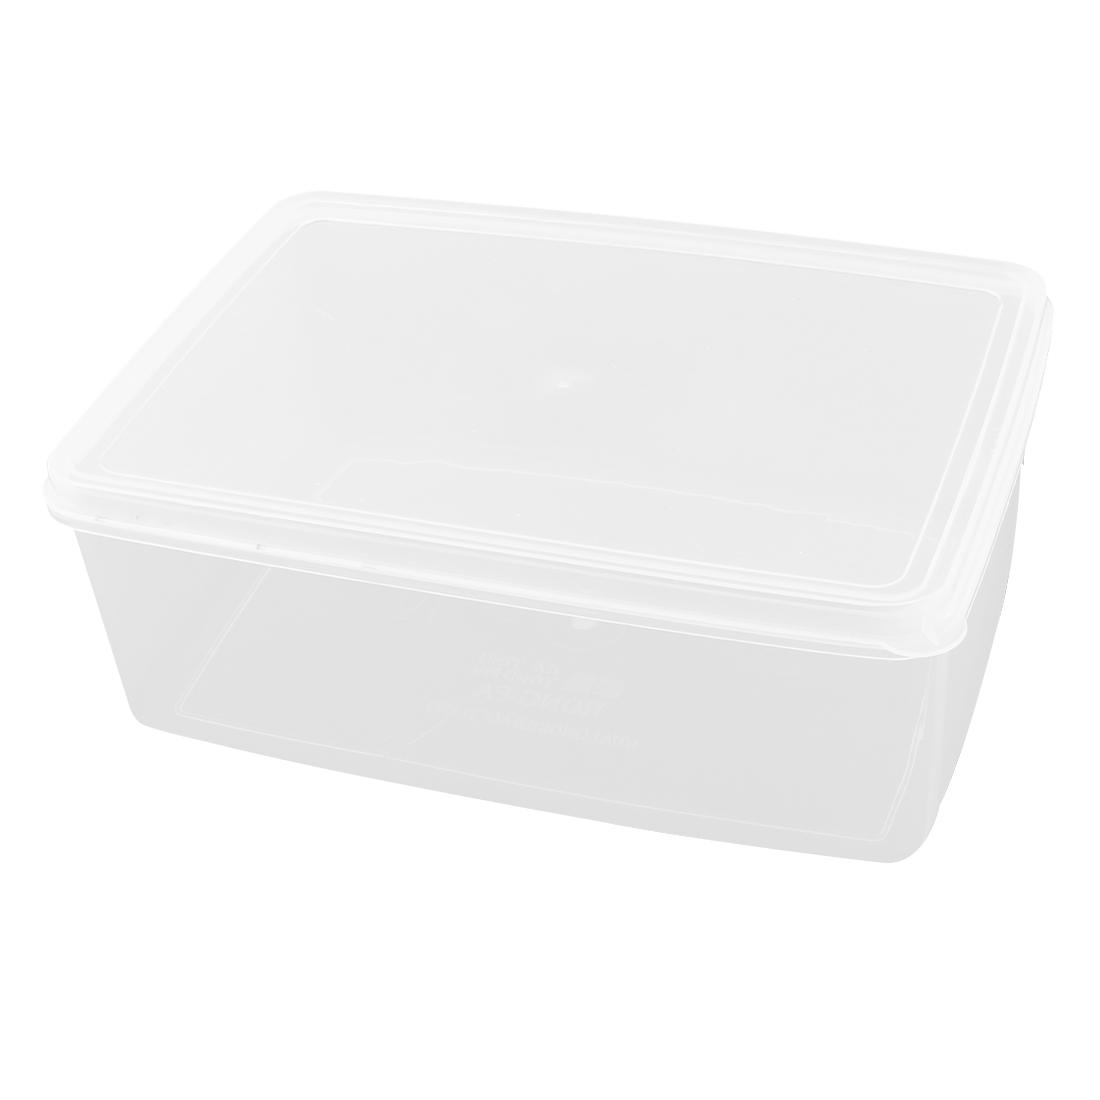 Portable Airtight Container Kitchen Ware Fridge Crisper Clear 220mmx150mmx80mm